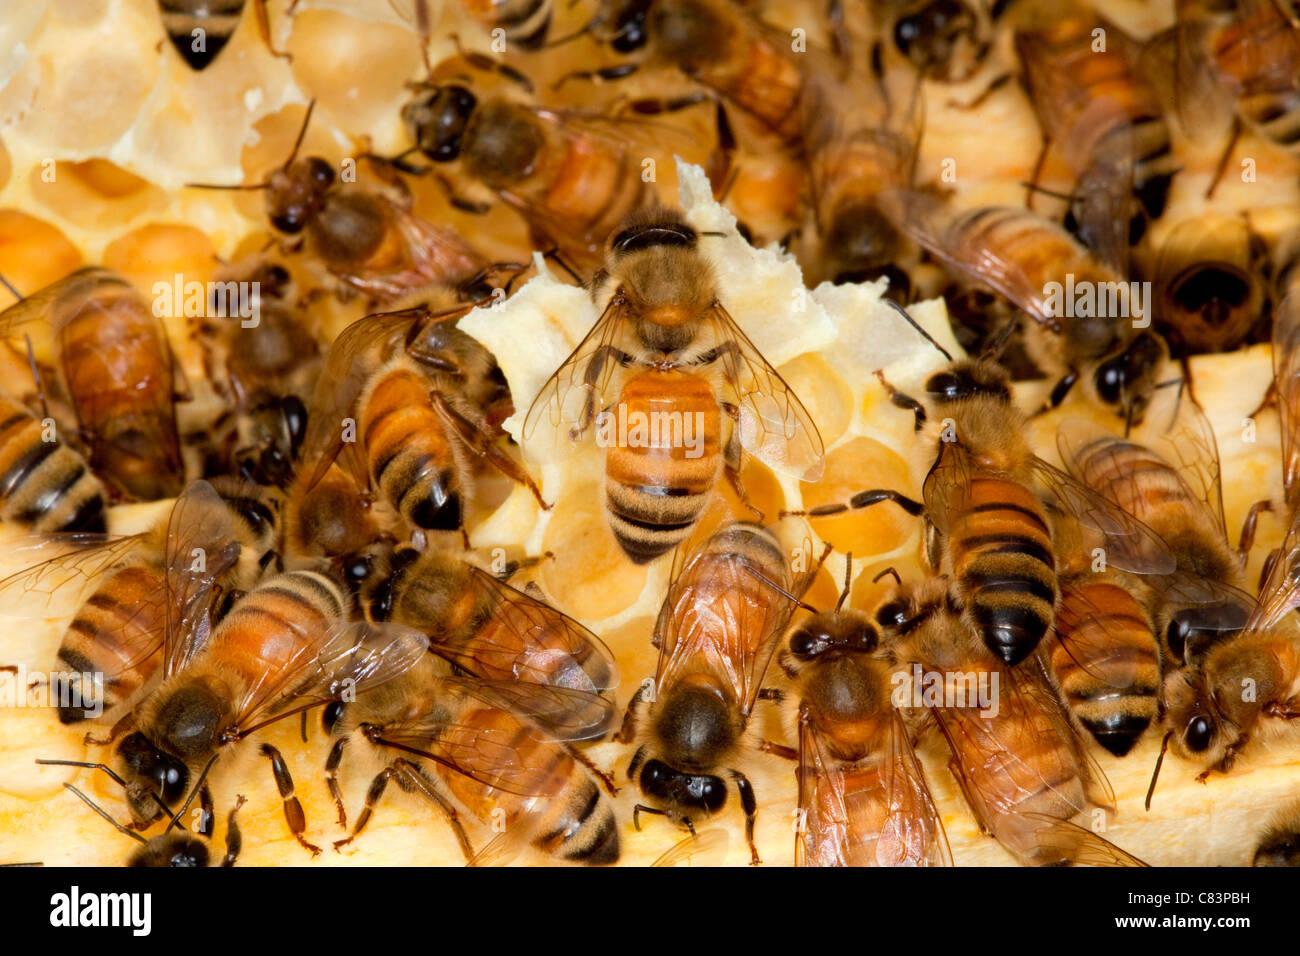 Una colonia de abejas de miel. Foto de stock